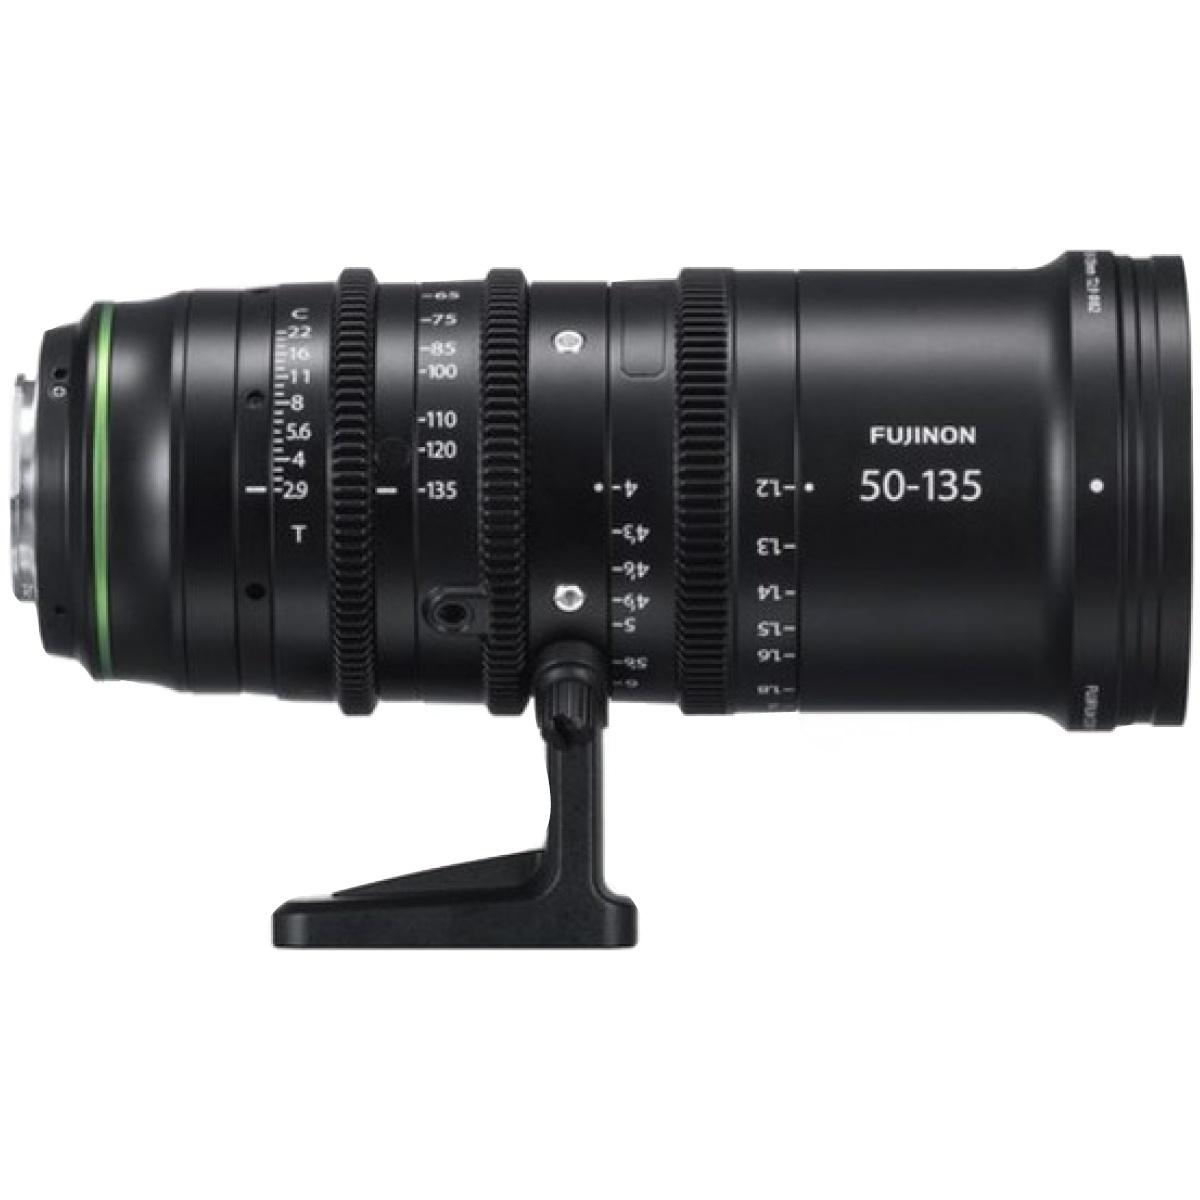 Fujifilm Fujinon MKX 50-135 mm 1:2.9